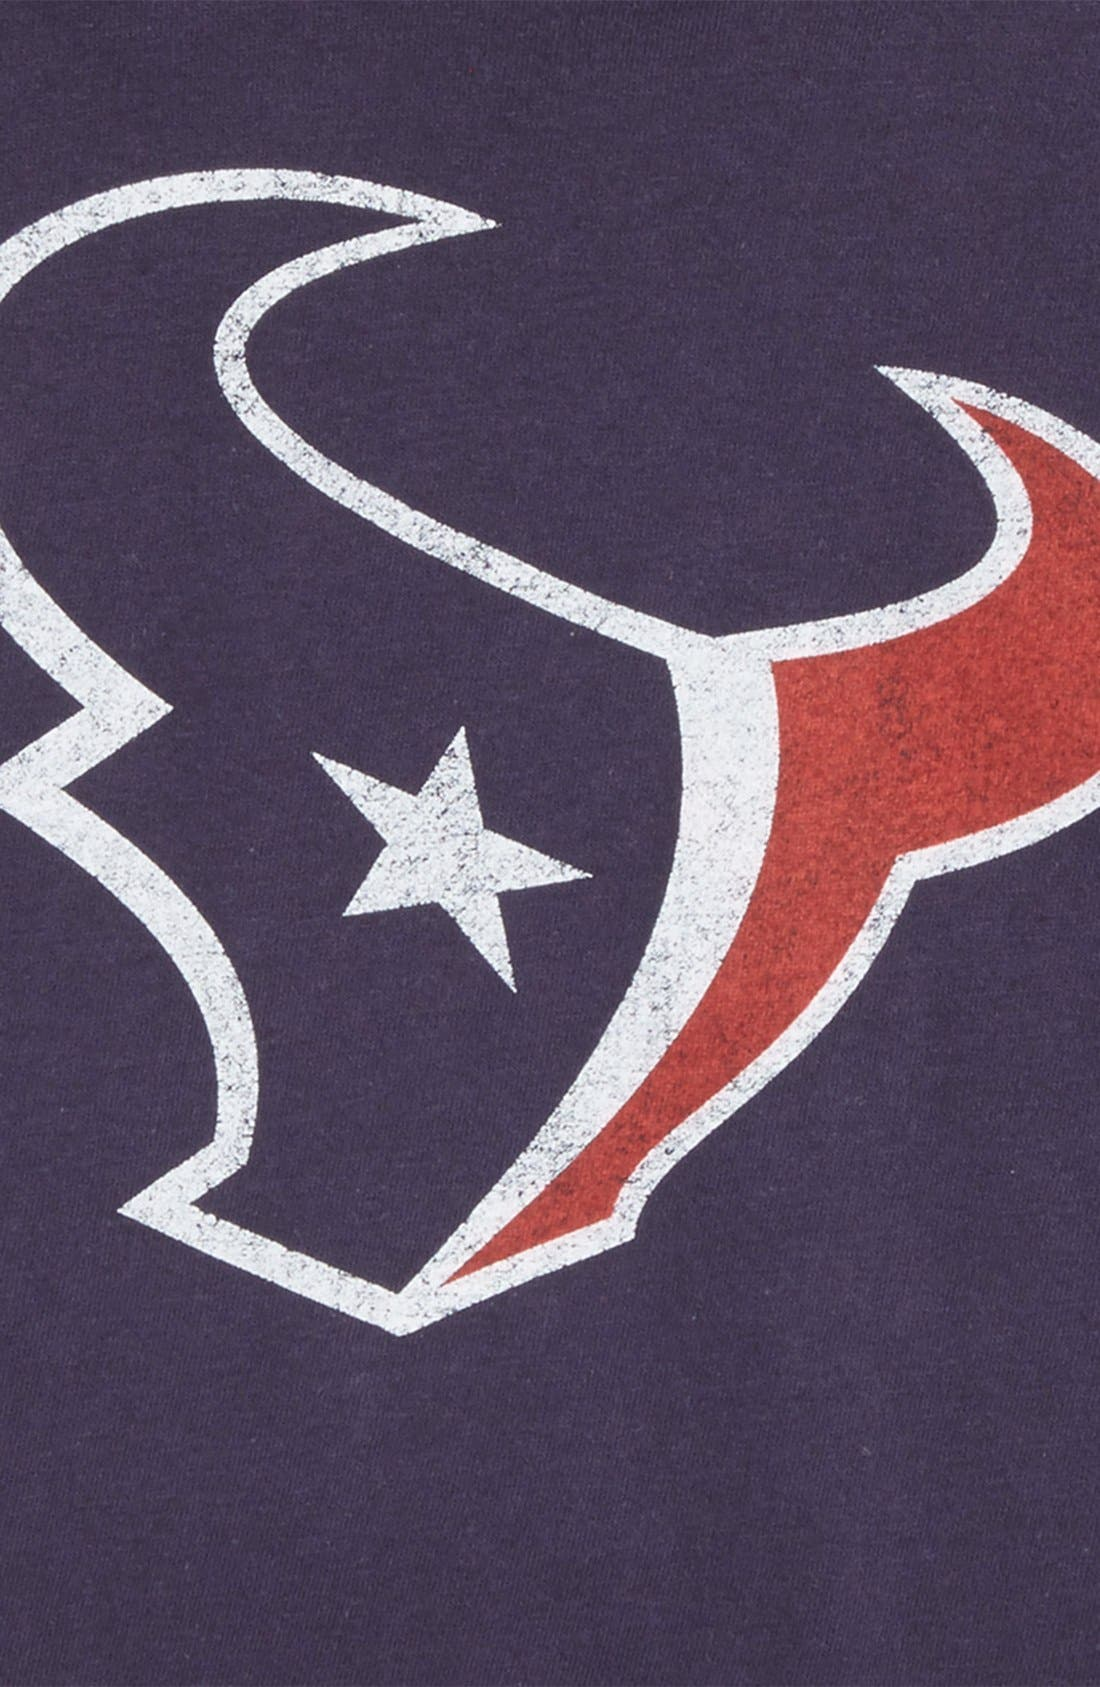 Alternate Image 2  - Outerstuff 'NFL - Houston Texans' Distressed Logo Graphic T-Shirt (Little Boys)